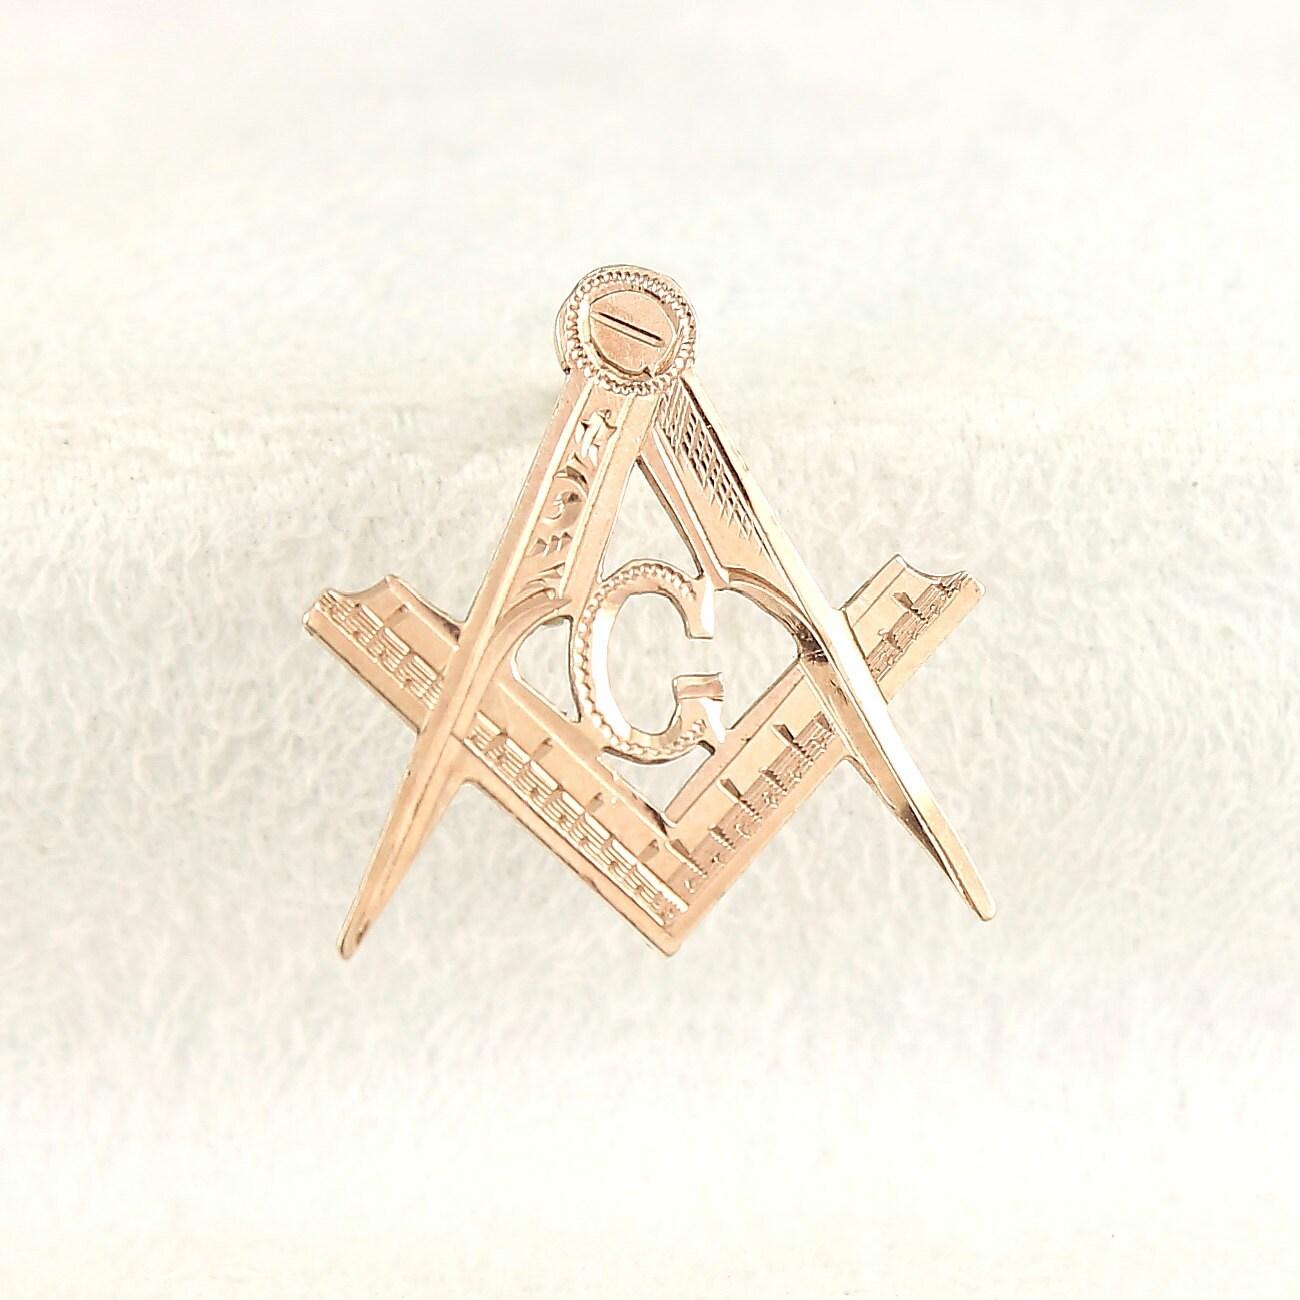 Masonic Antique Lapel Pin 14k Gold By Vintagemasonry On Etsy